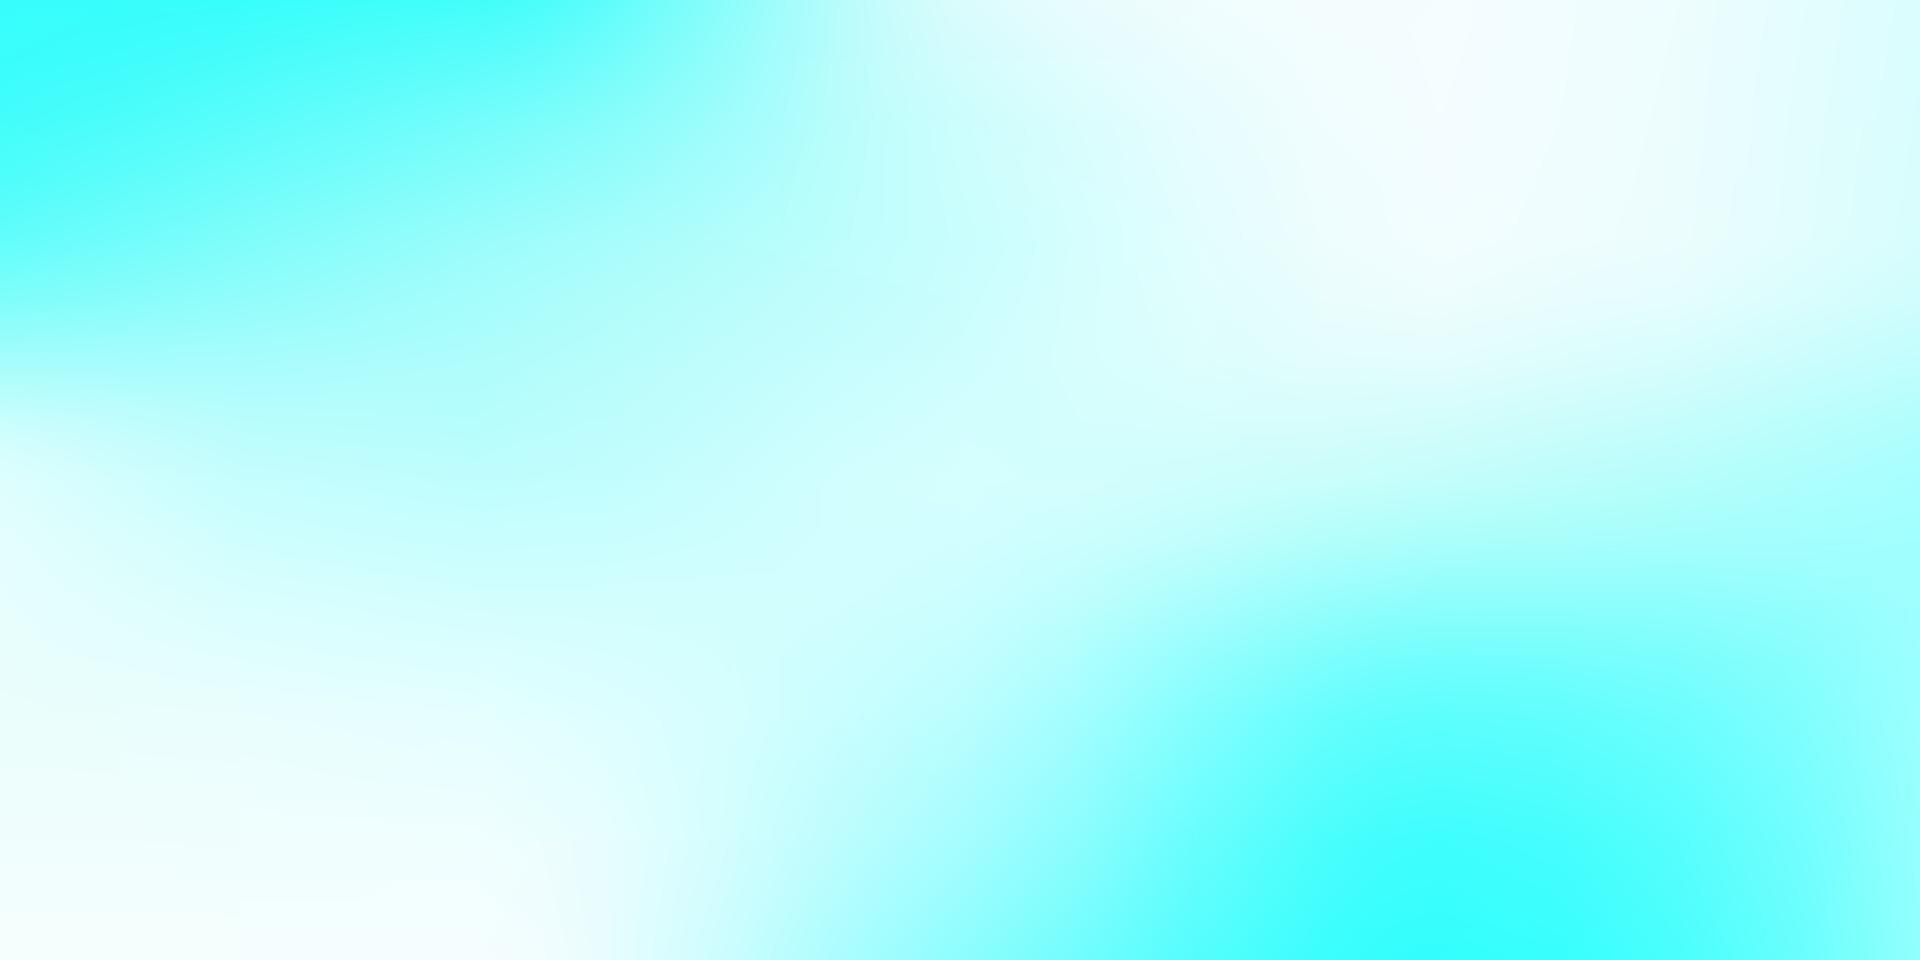 lichtblauwe, groene vector abstracte achtergrond wazig.